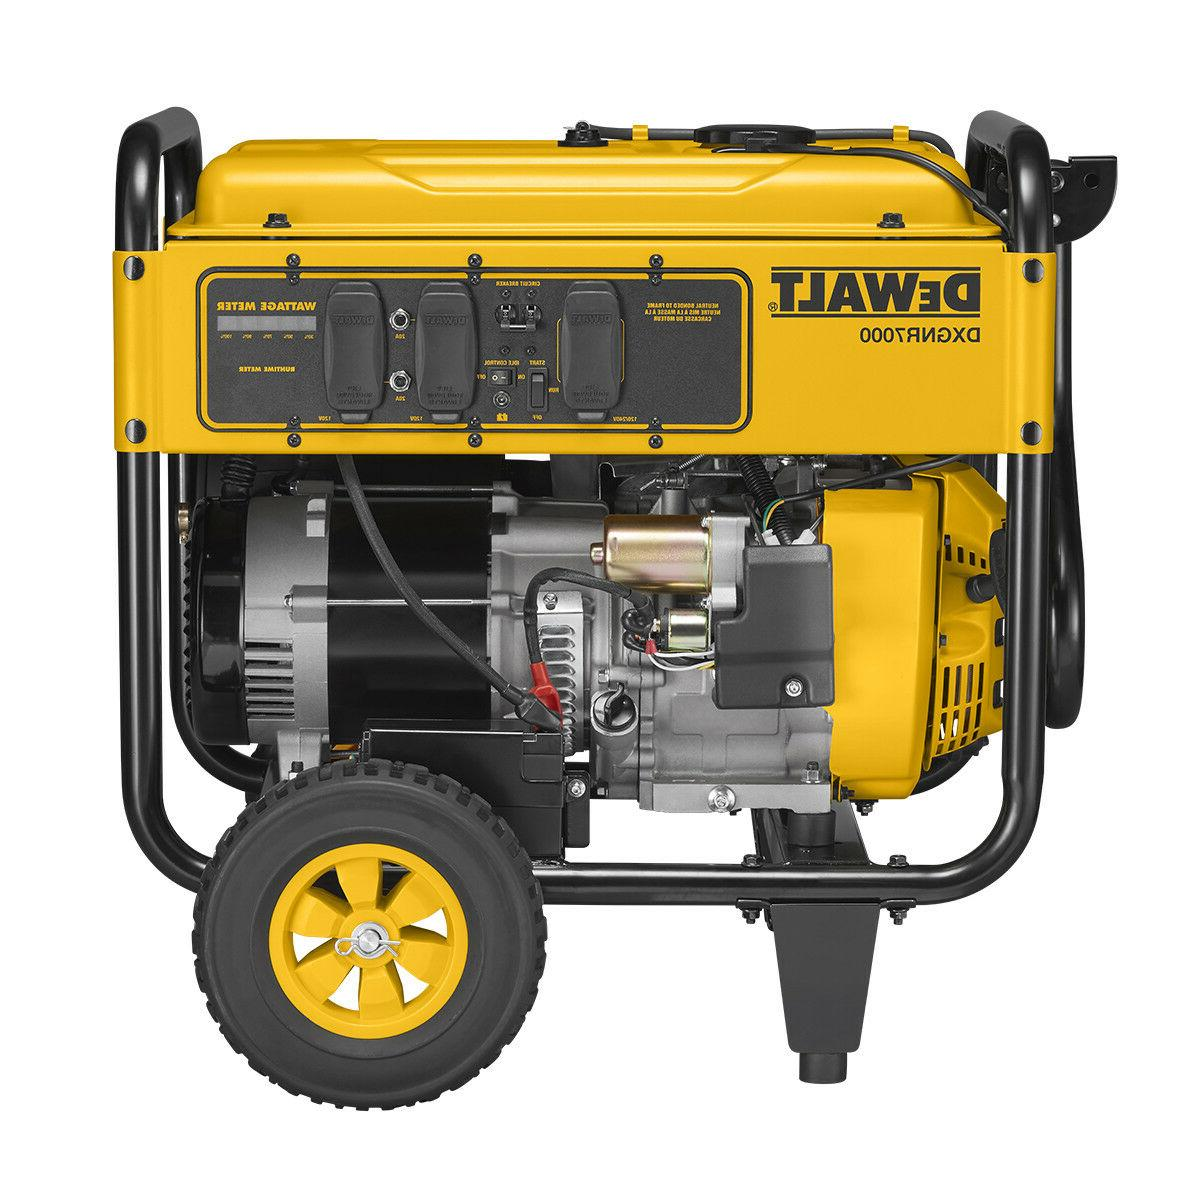 DeWALT Generator Electric   DXGNR7000 ST